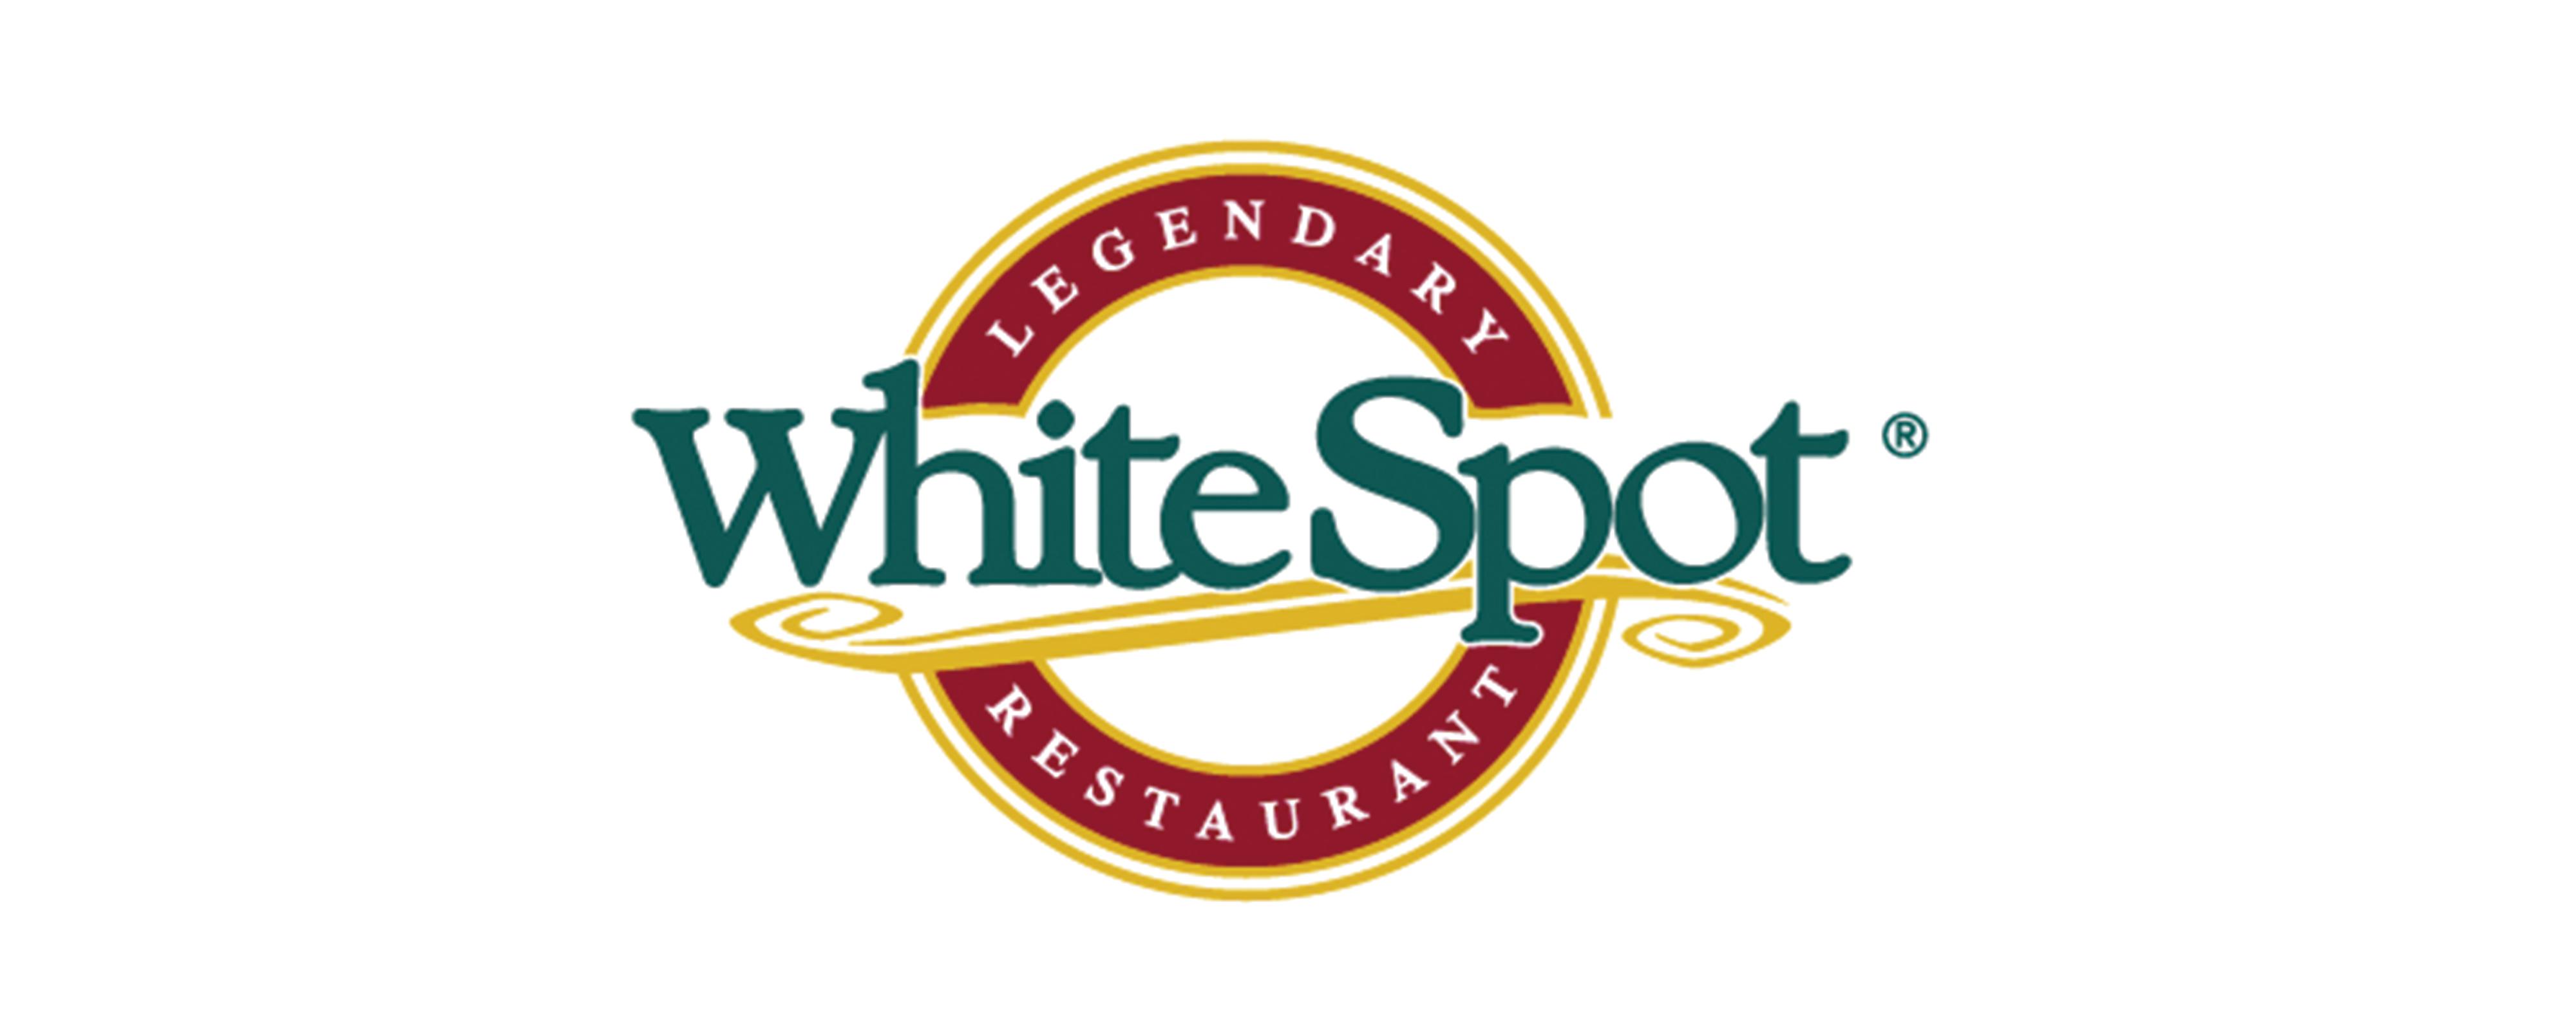 Whitespot logo